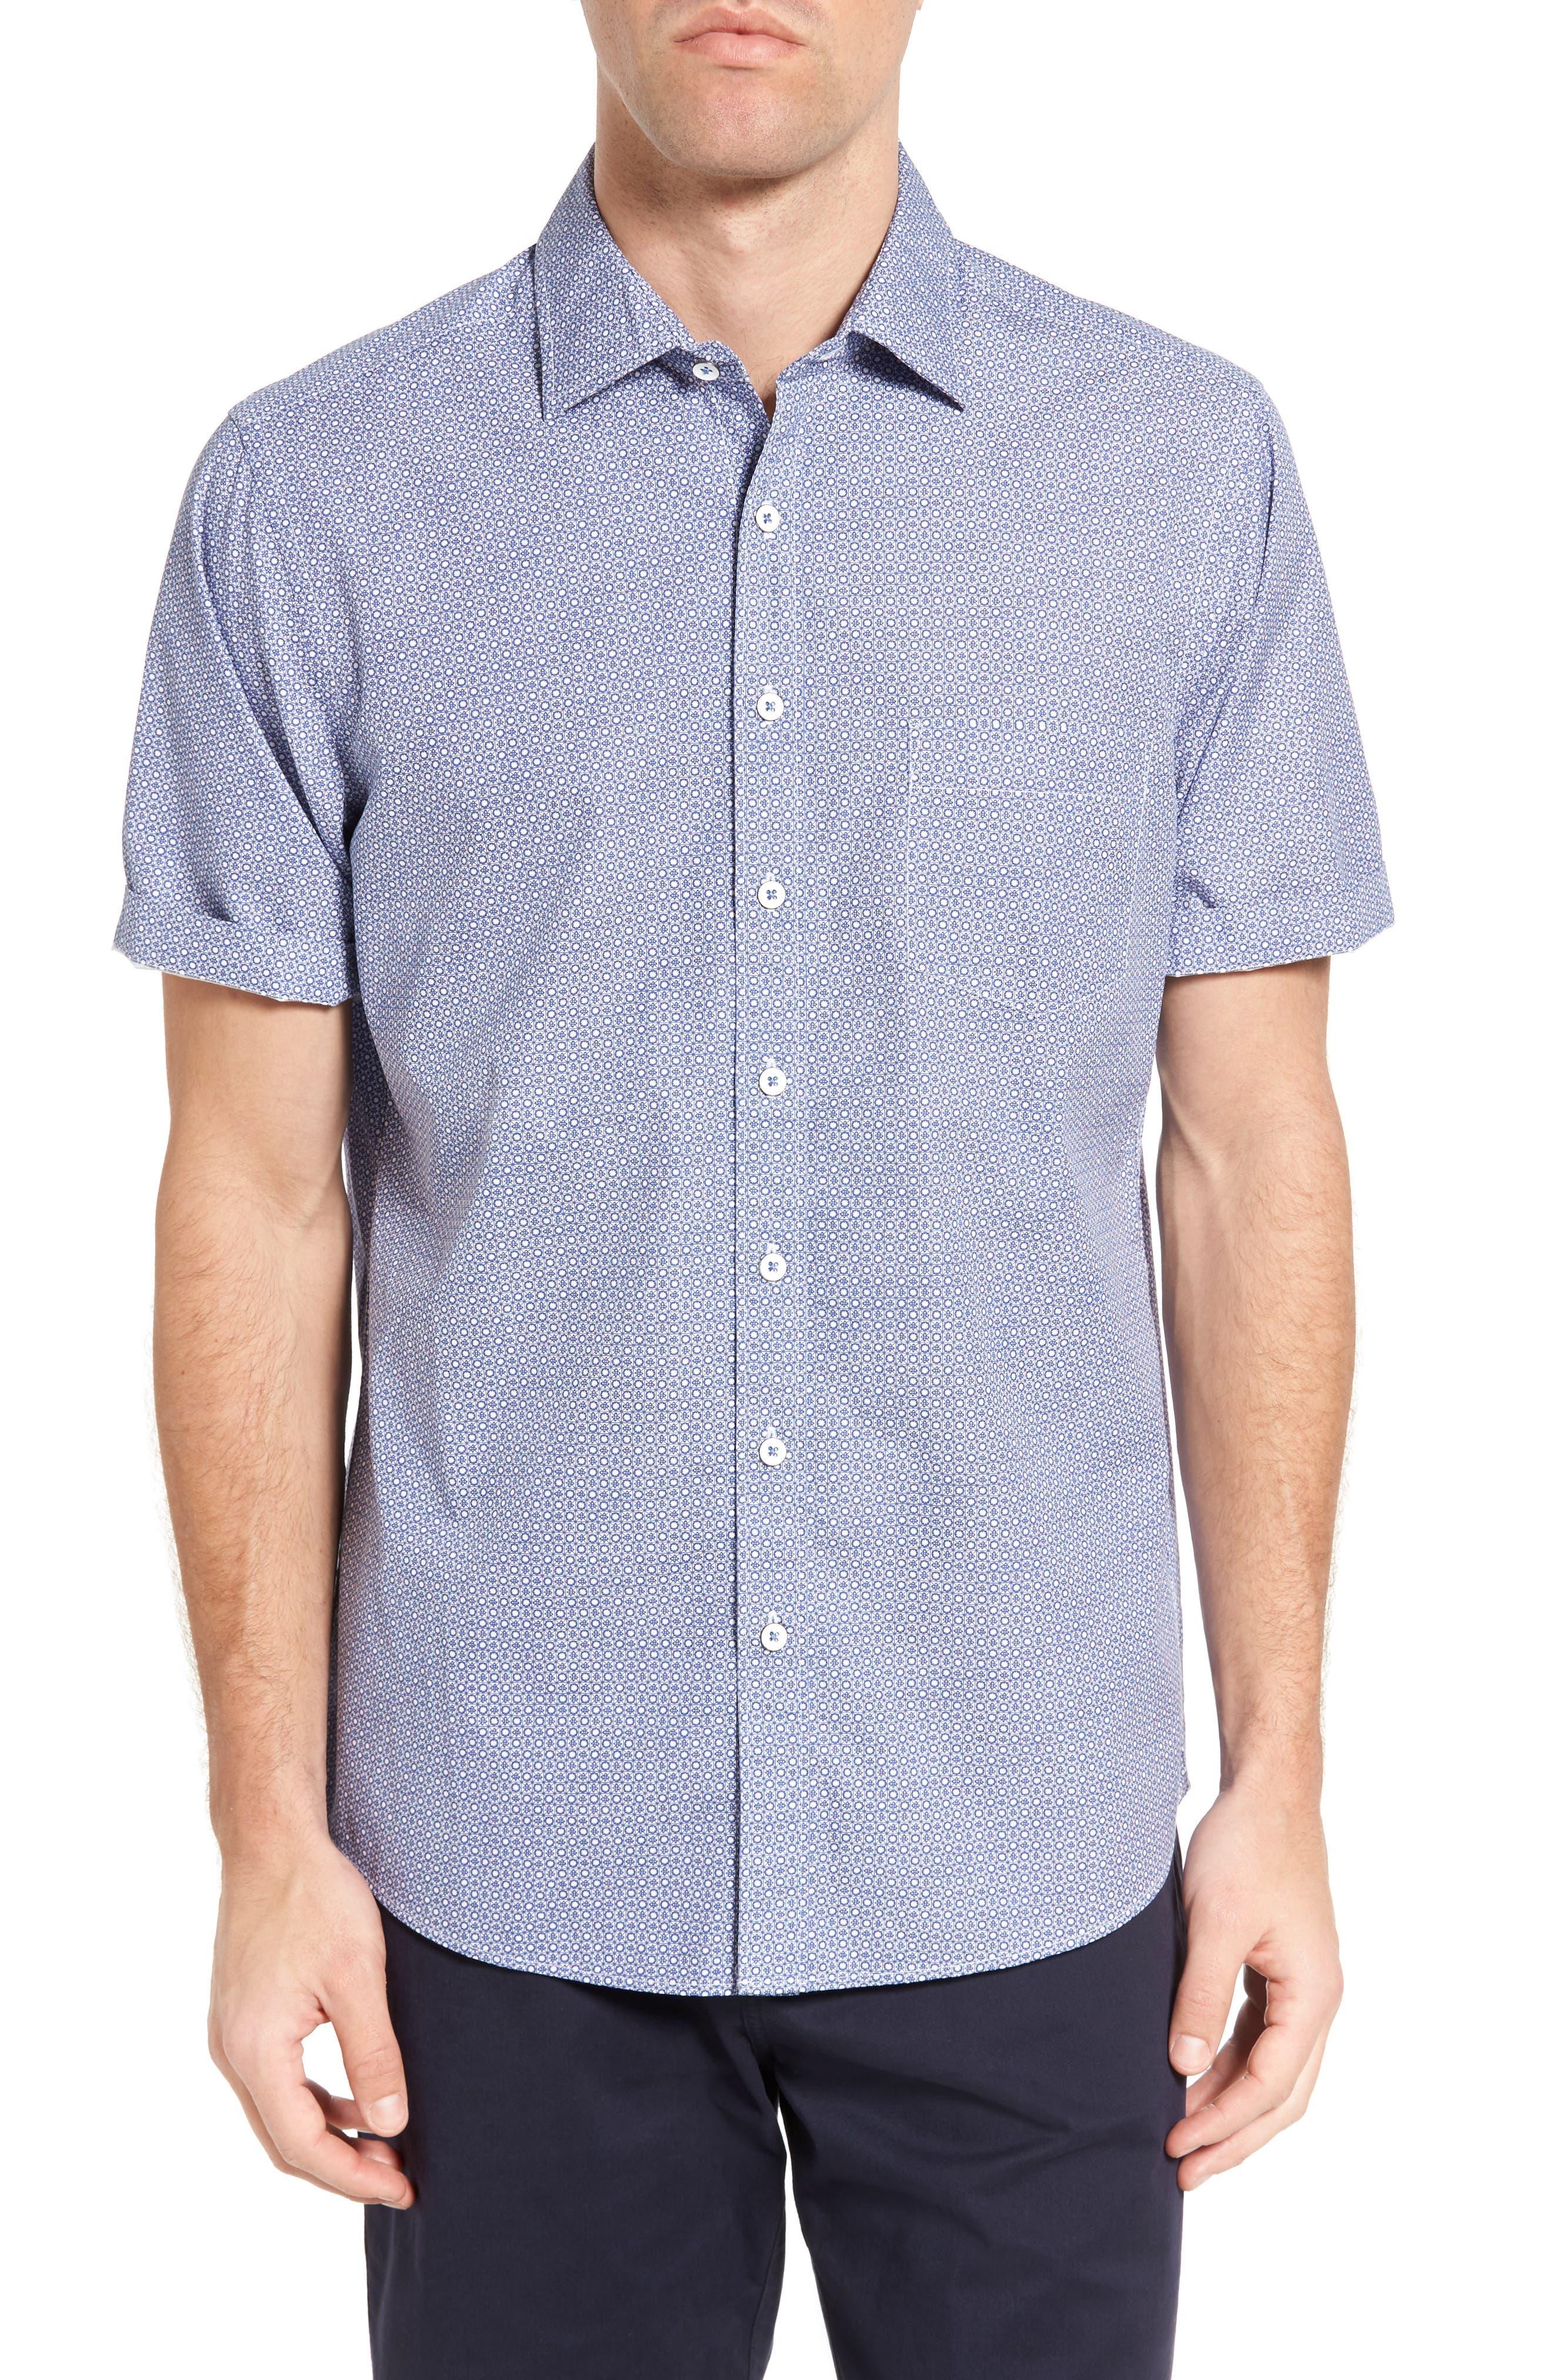 Alternate Image 1 Selected - Rodd & Gunn Sullivan Regular Fit Print Sport Shirt